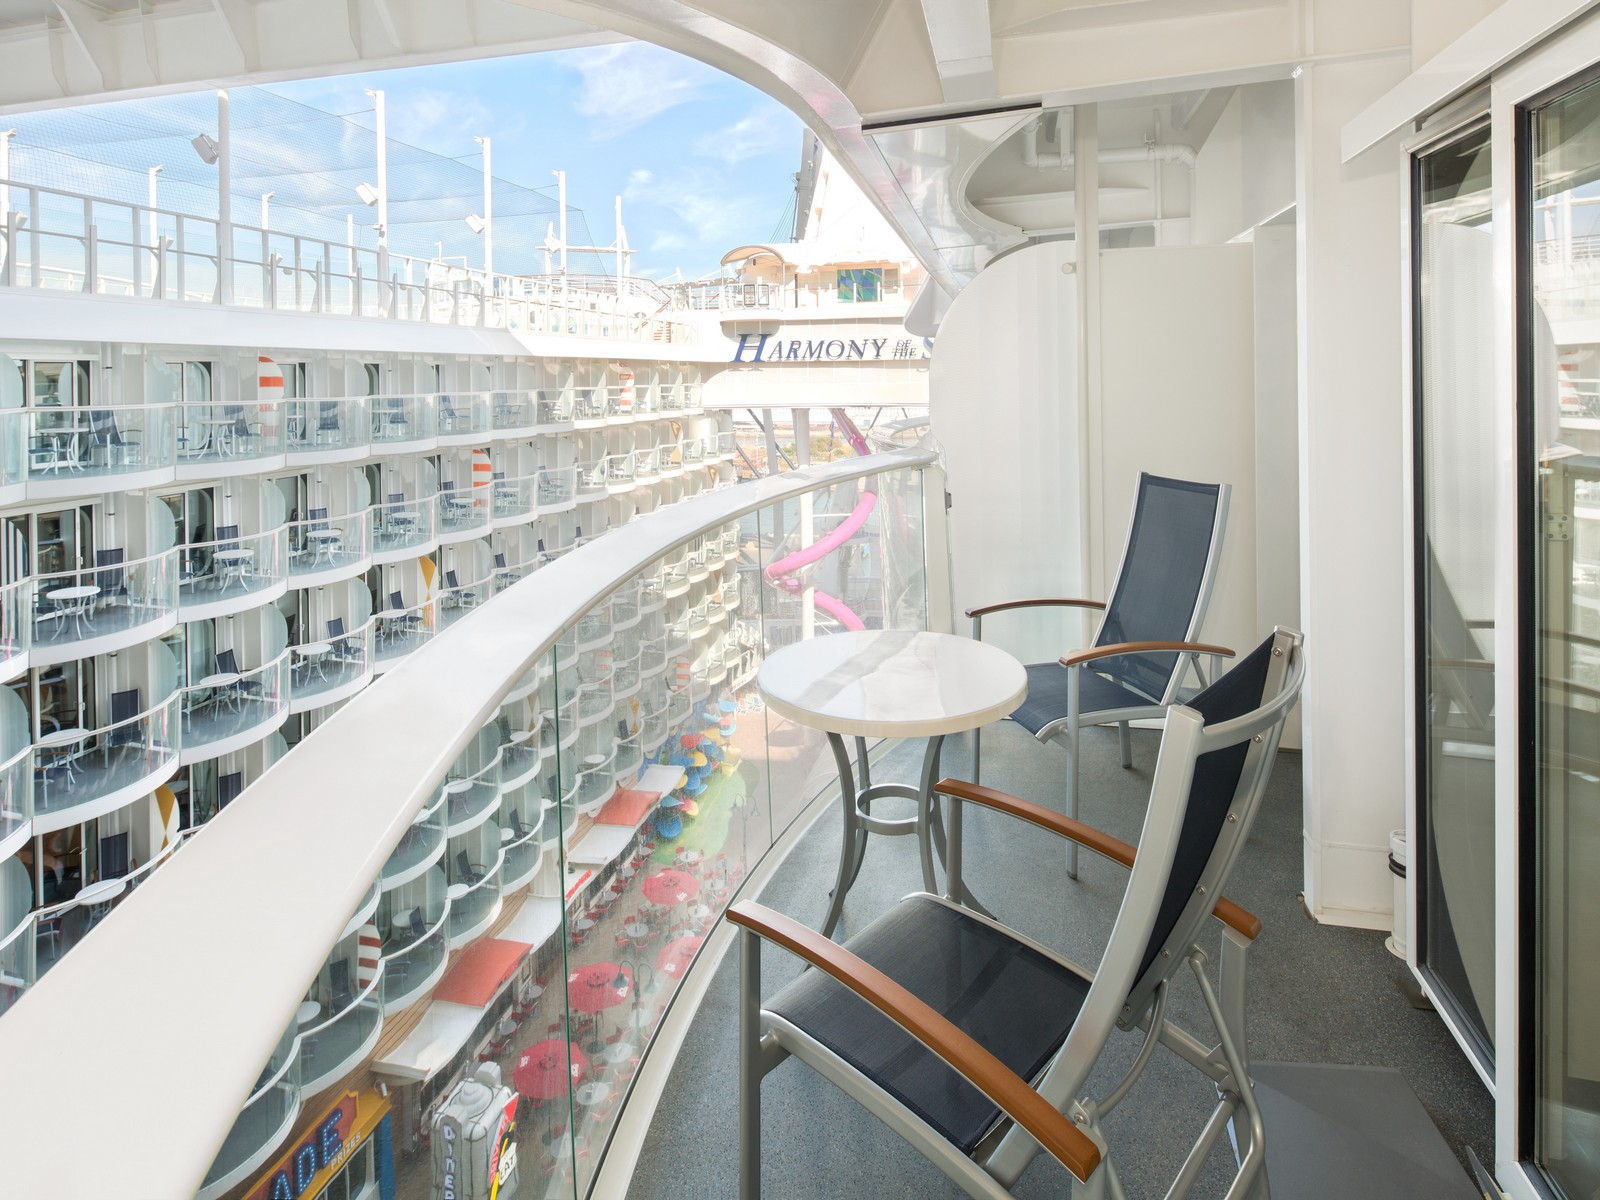 10 Weird and Wonderful Cruise Ship Cabin Types   Cruise.Blog